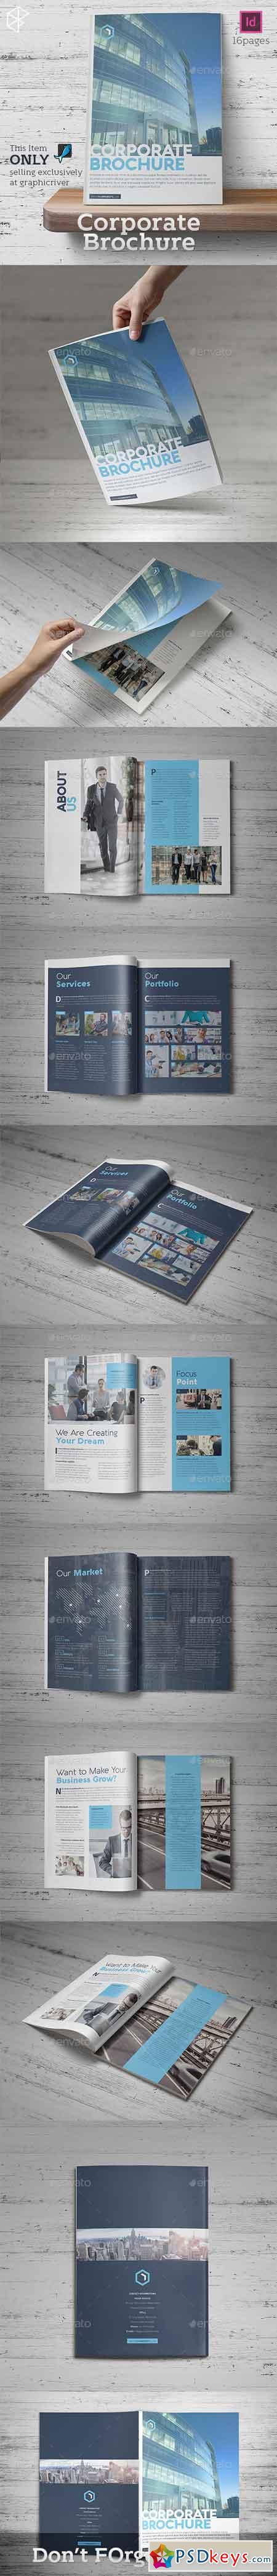 Corporate Brochure 13341763